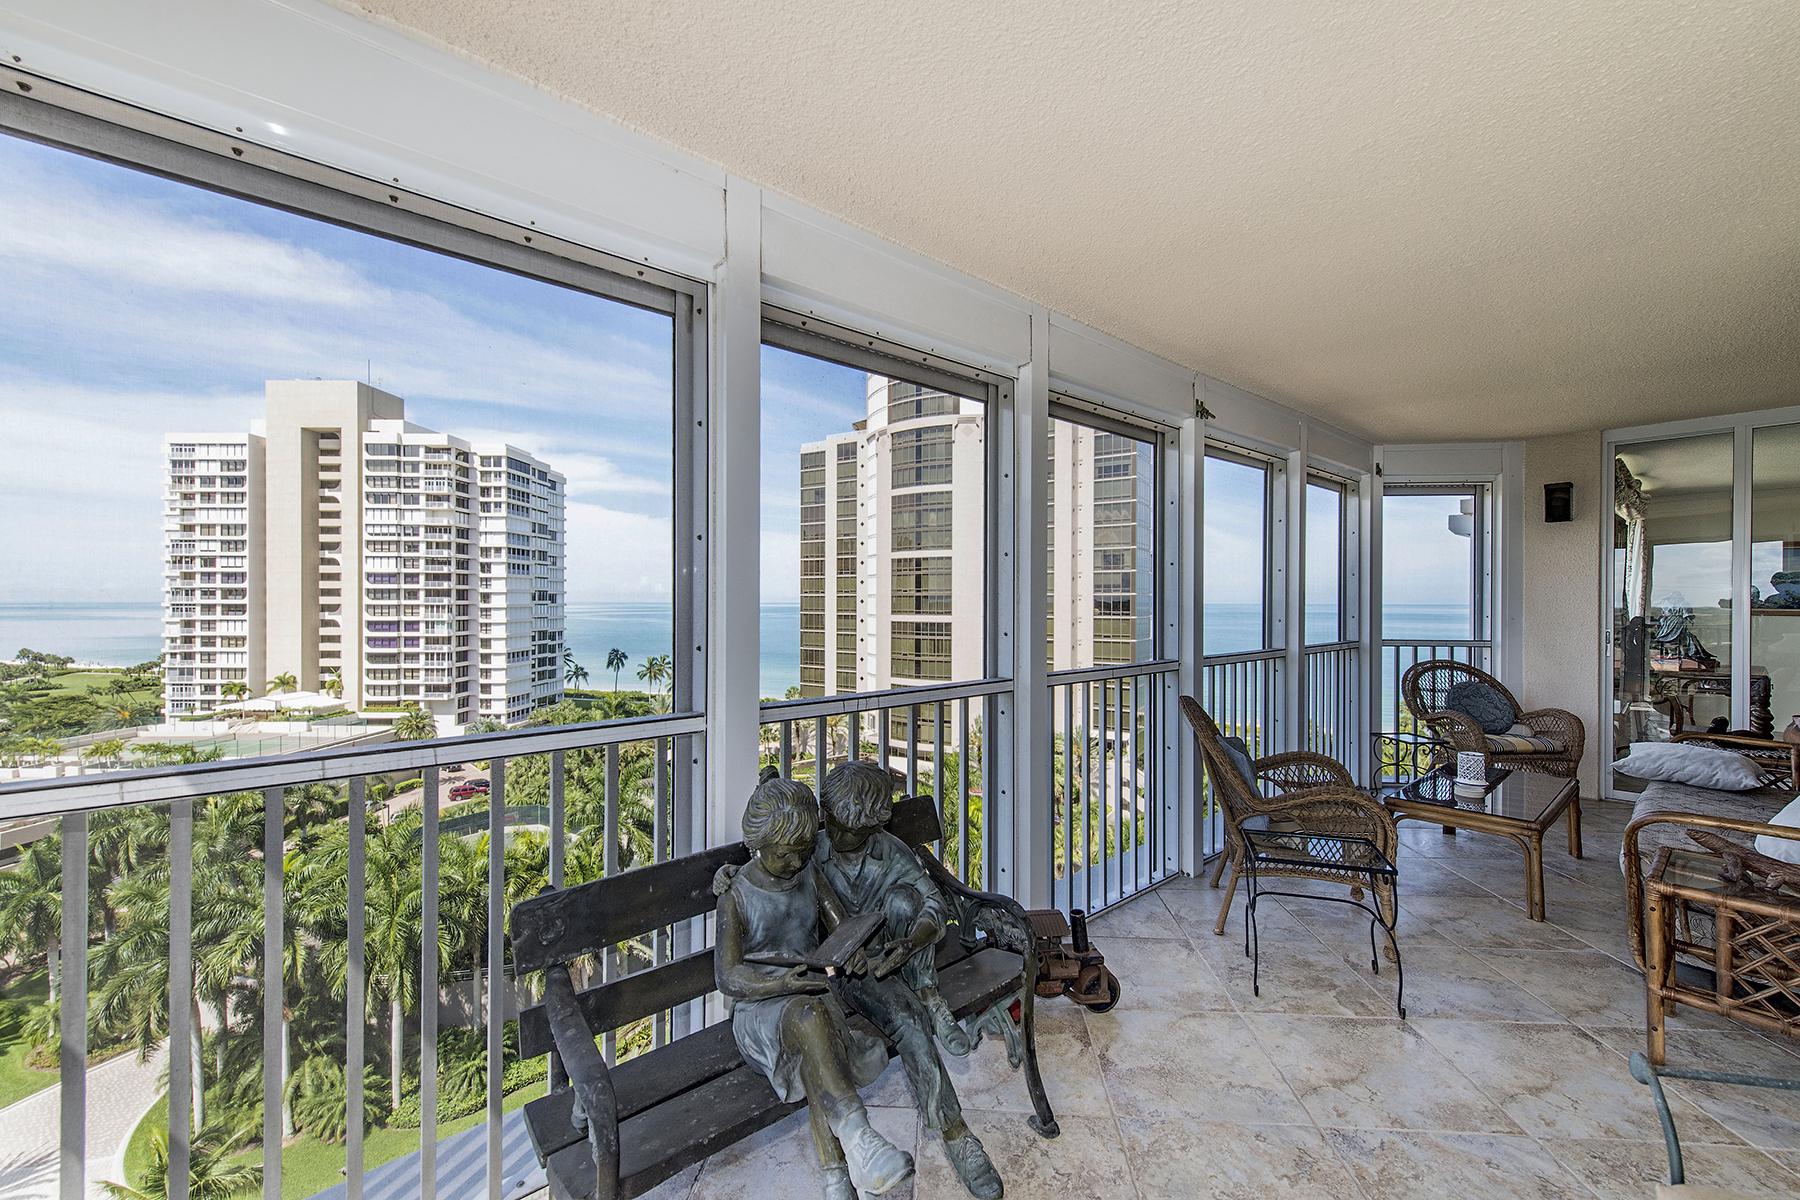 Кооперативная квартира для того Продажа на PARK SHORE - MONACO BEACH CLUB 4401 Gulf Shore Blvd N 1107 Naples, Флорида 34103 Соединенные Штаты